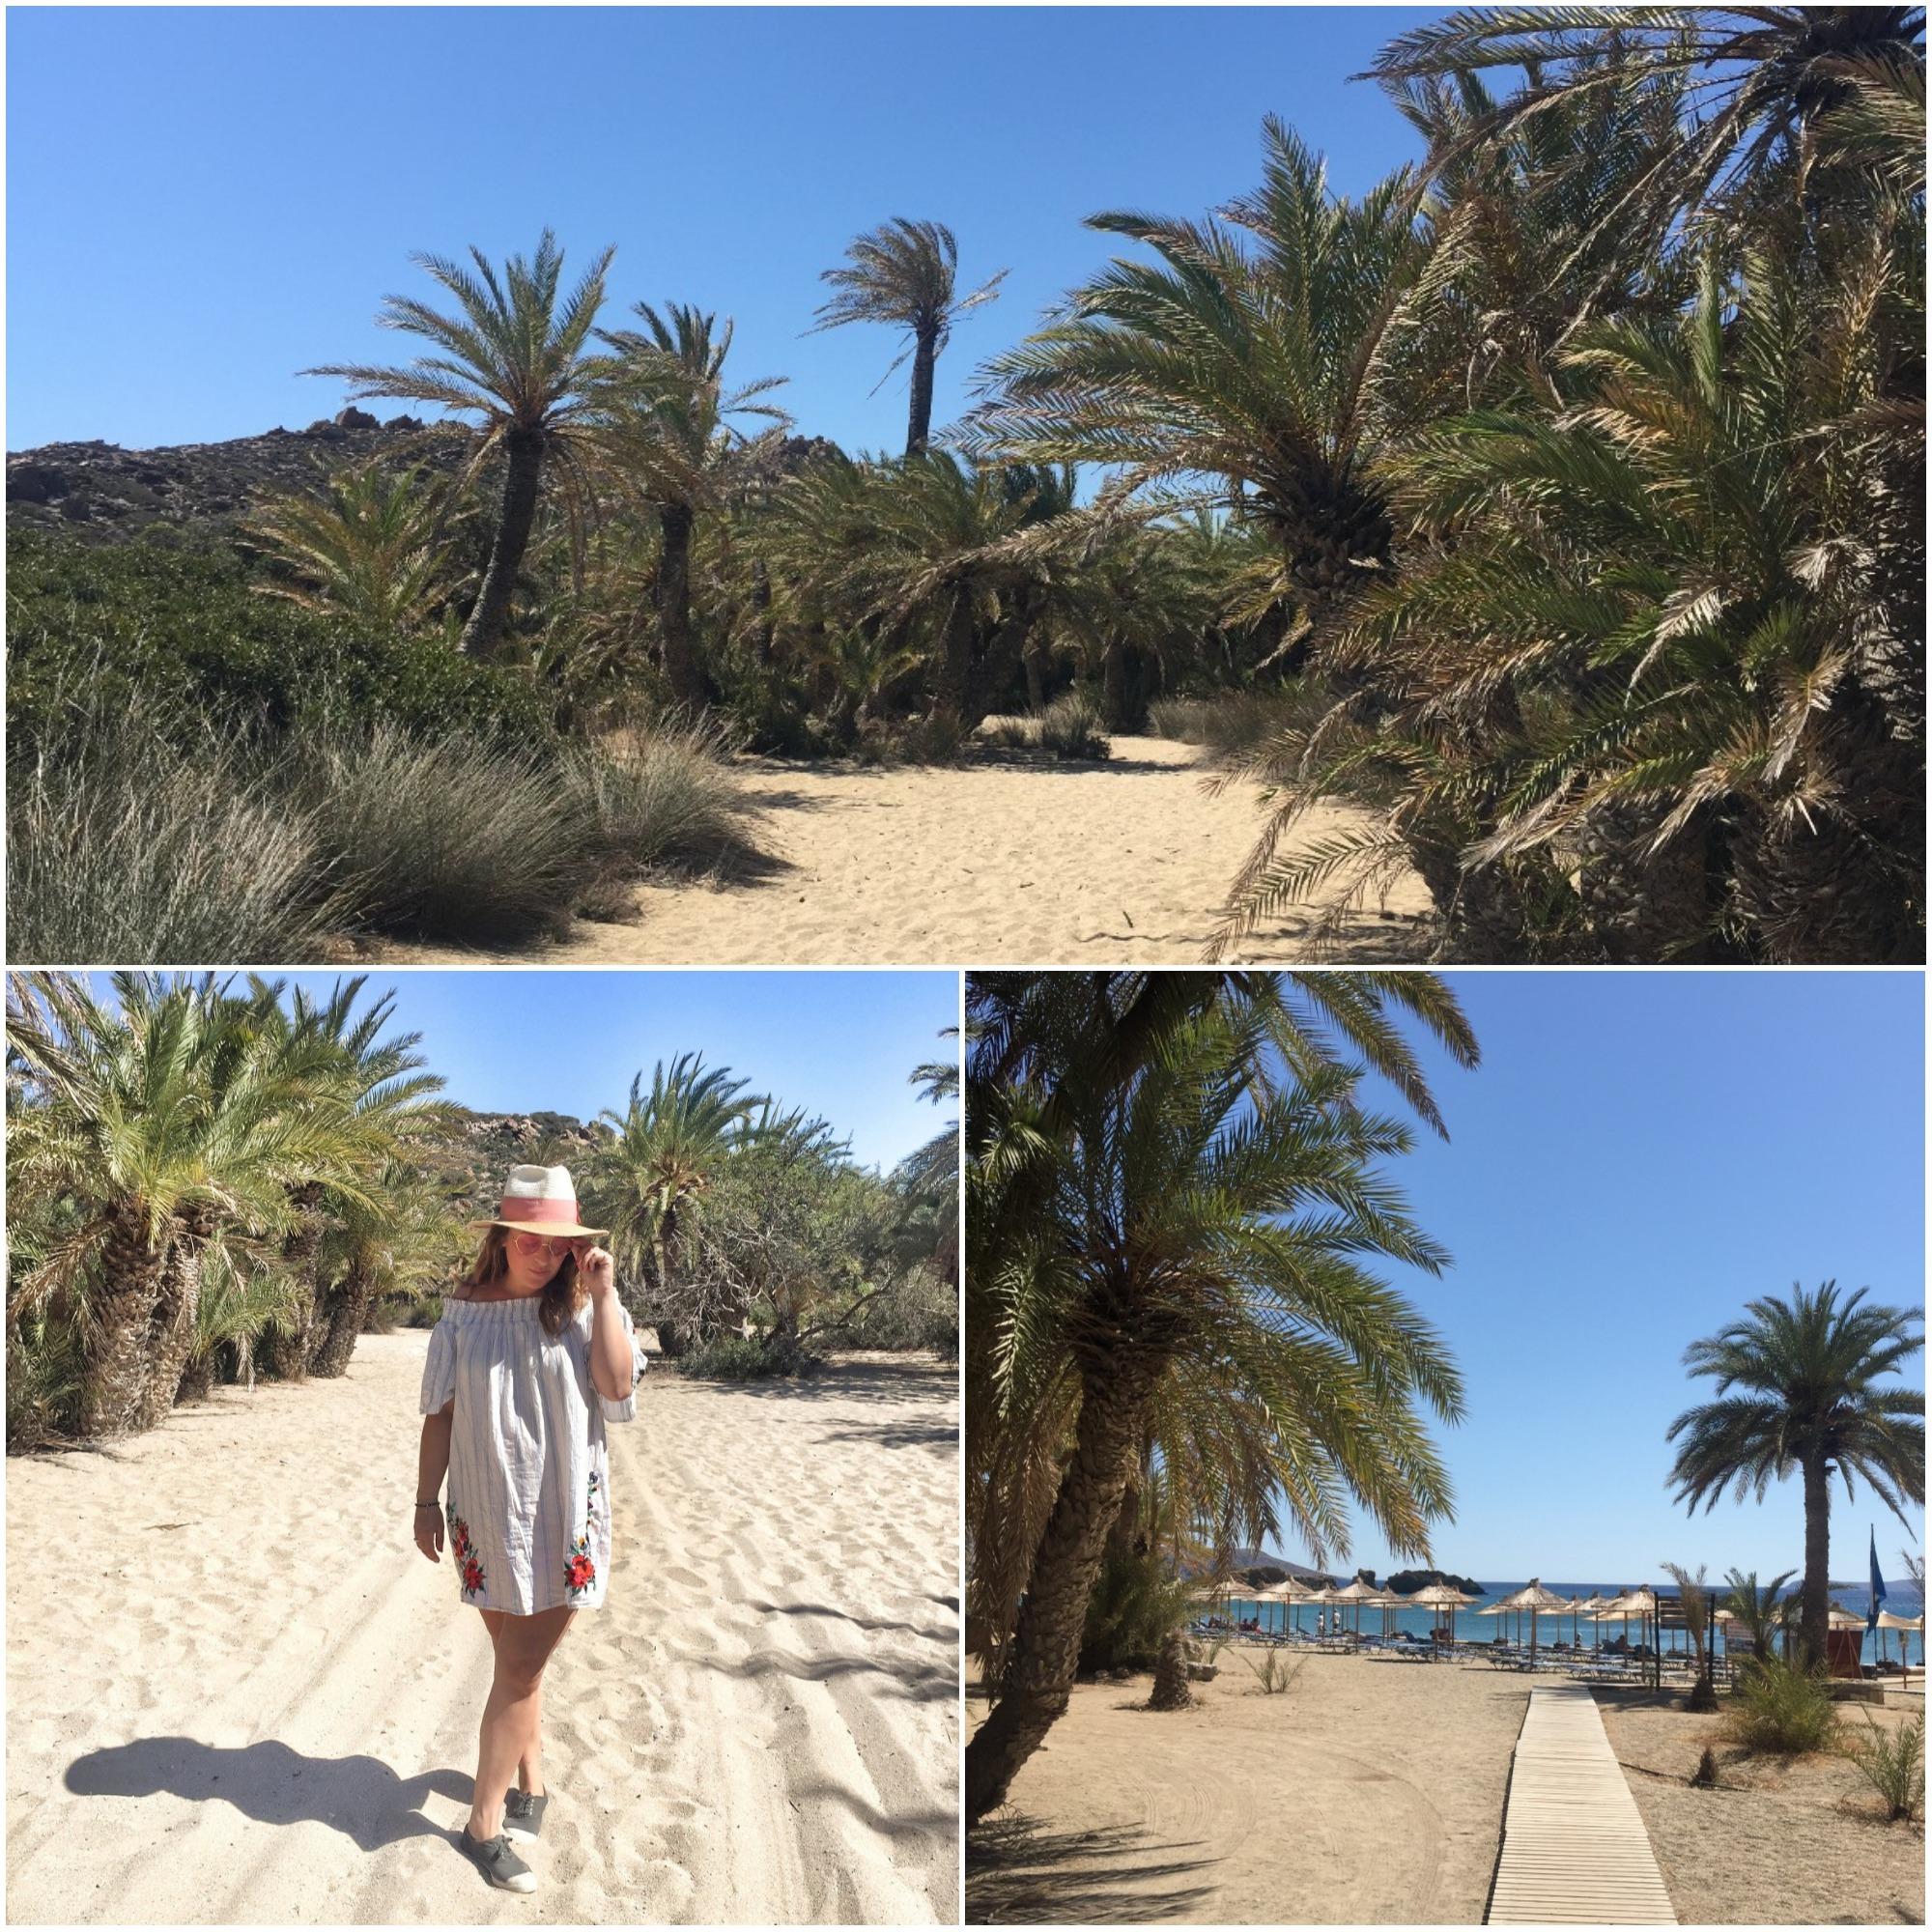 palmeraie de Vai plage crète